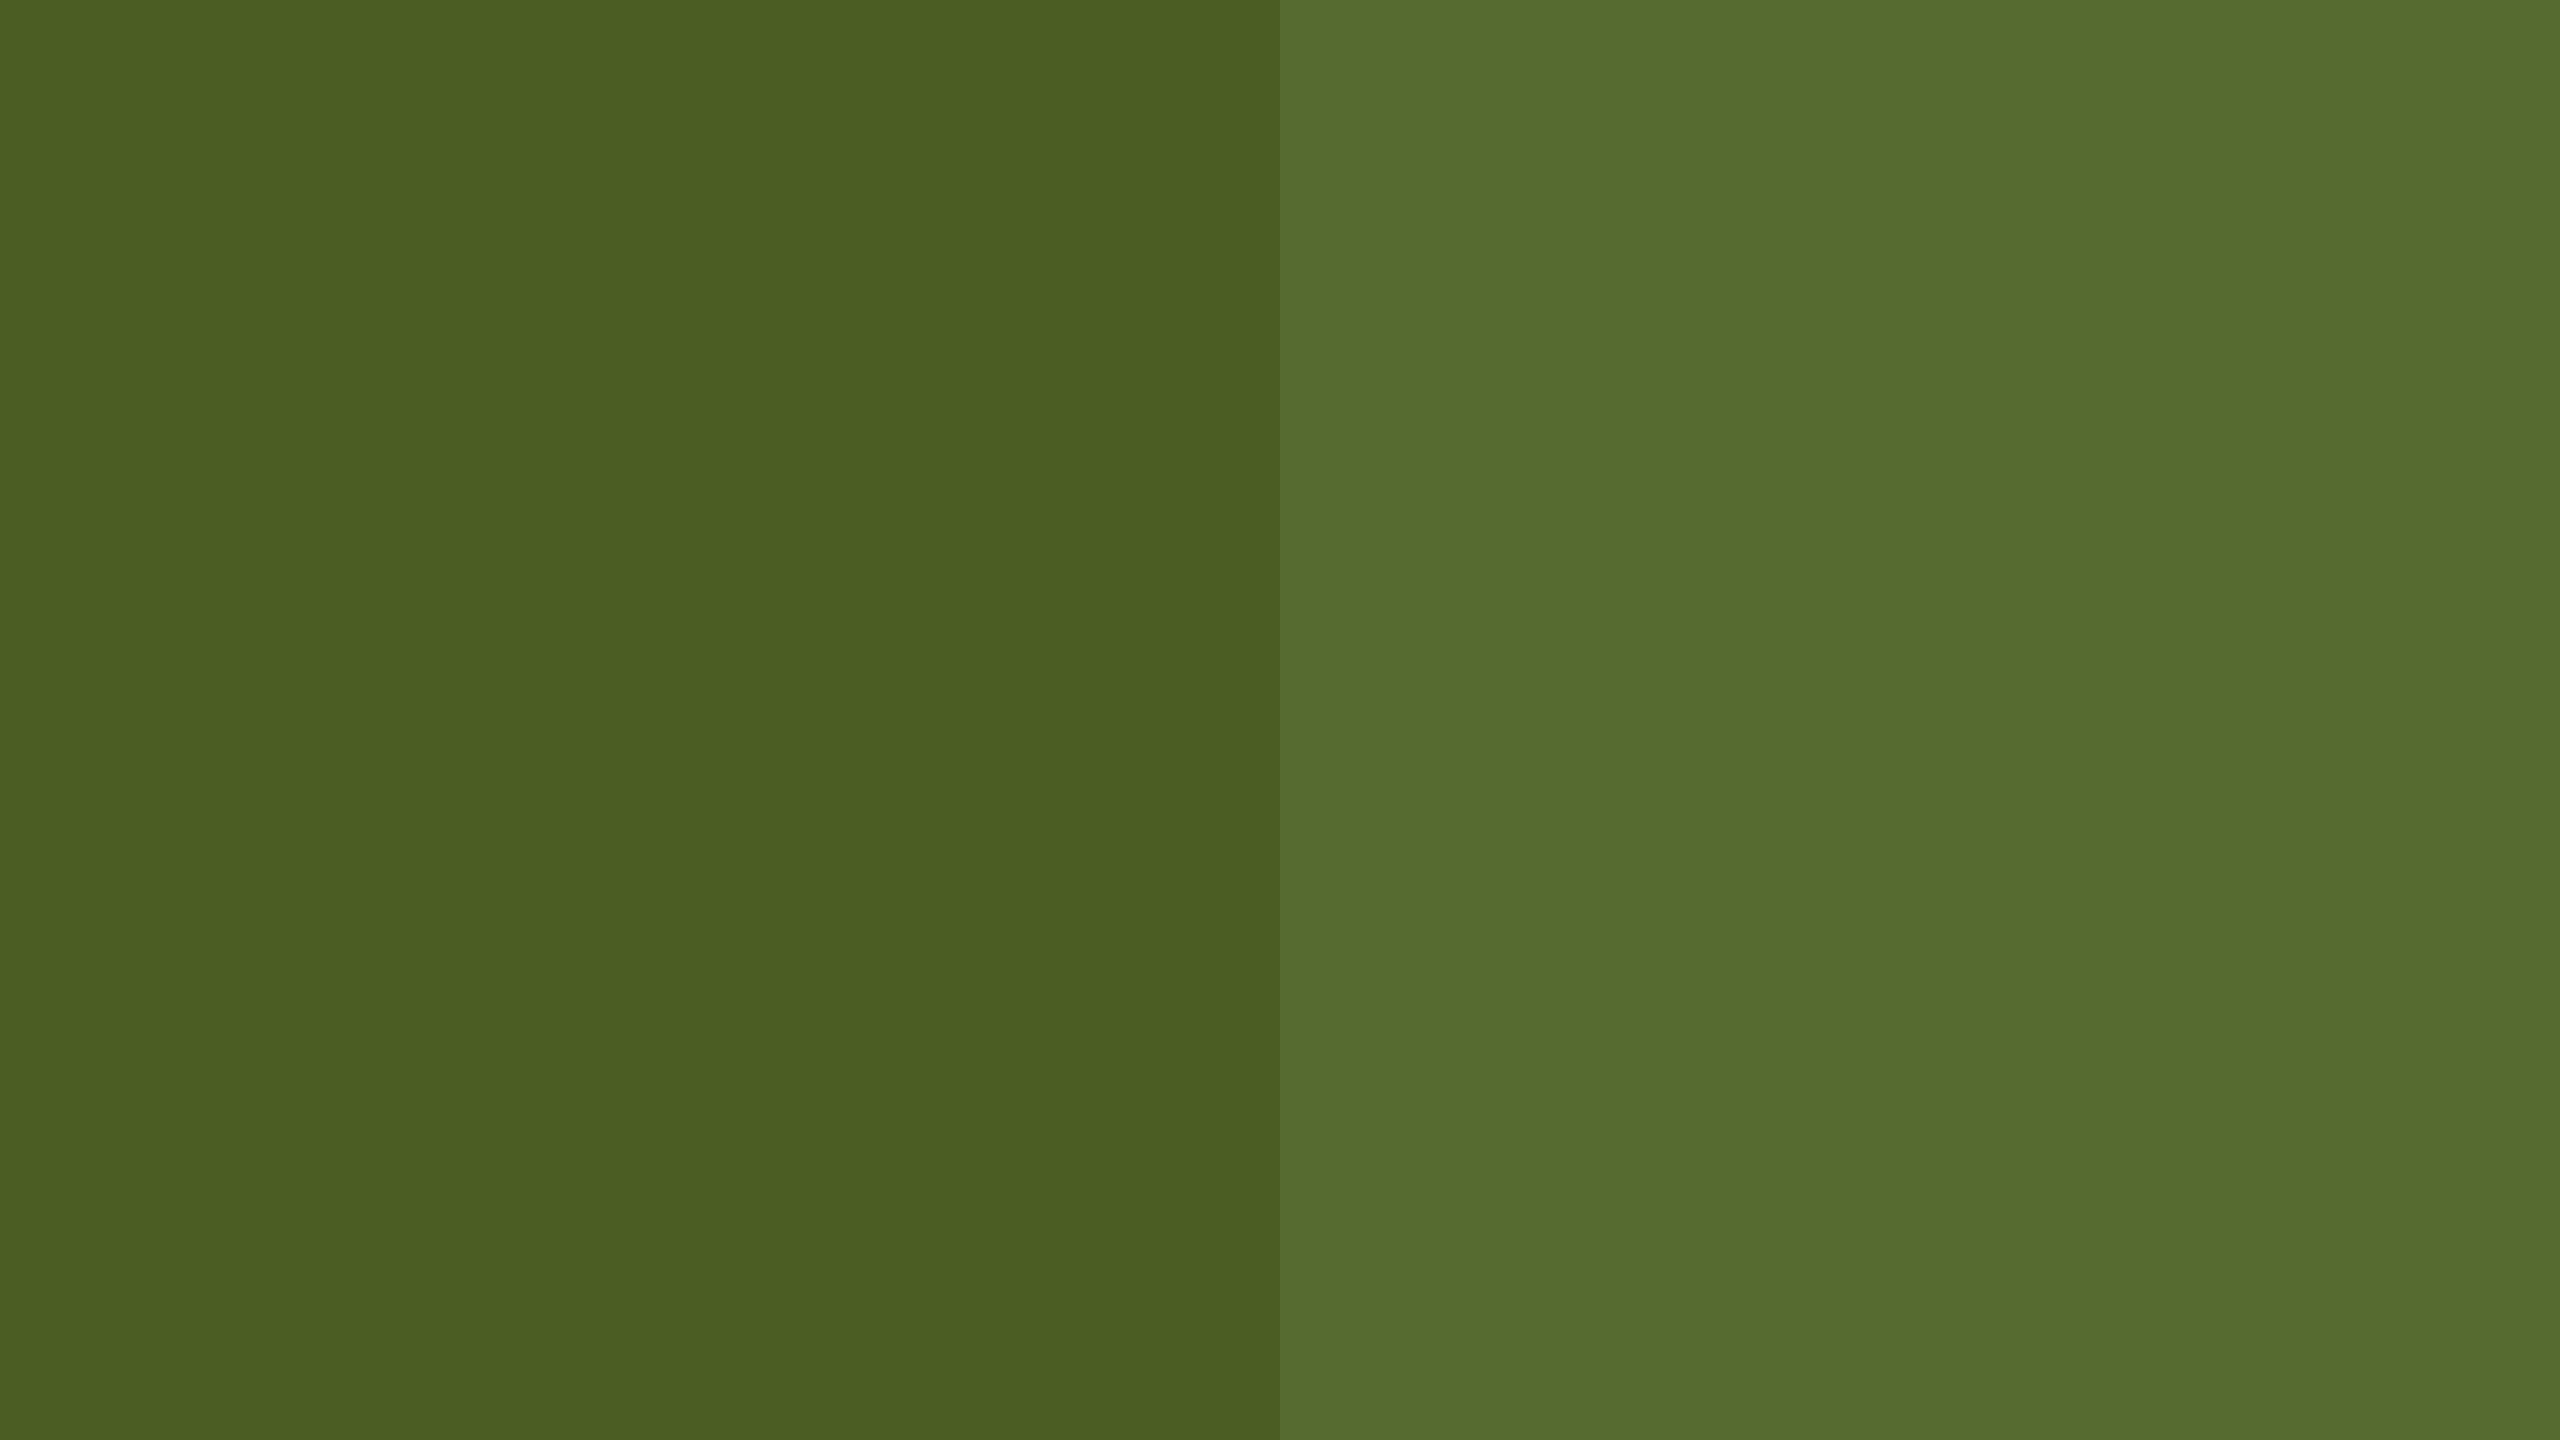 Res: 2560x1440, Olive Green Wallpaper - WallpaperSafari